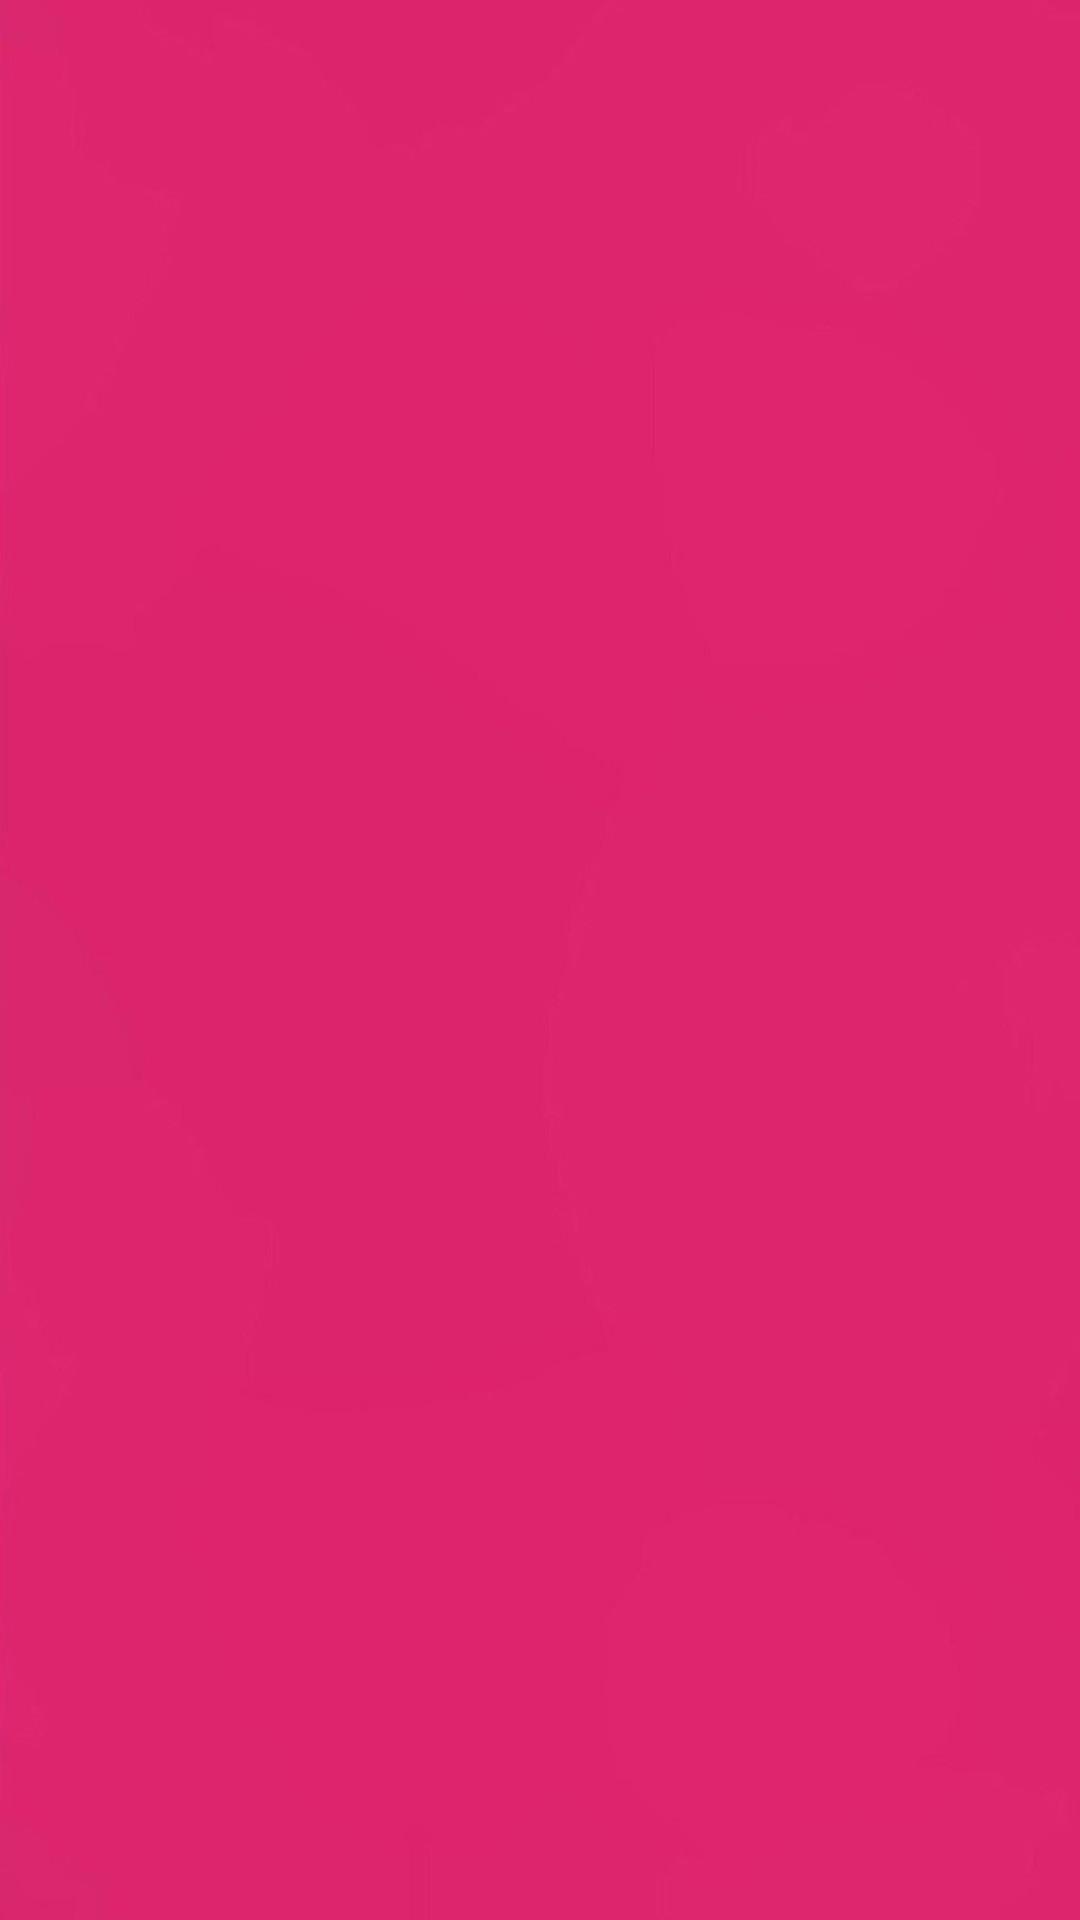 Simple-pink-background-iPhone-7-Wallpaper.jpg